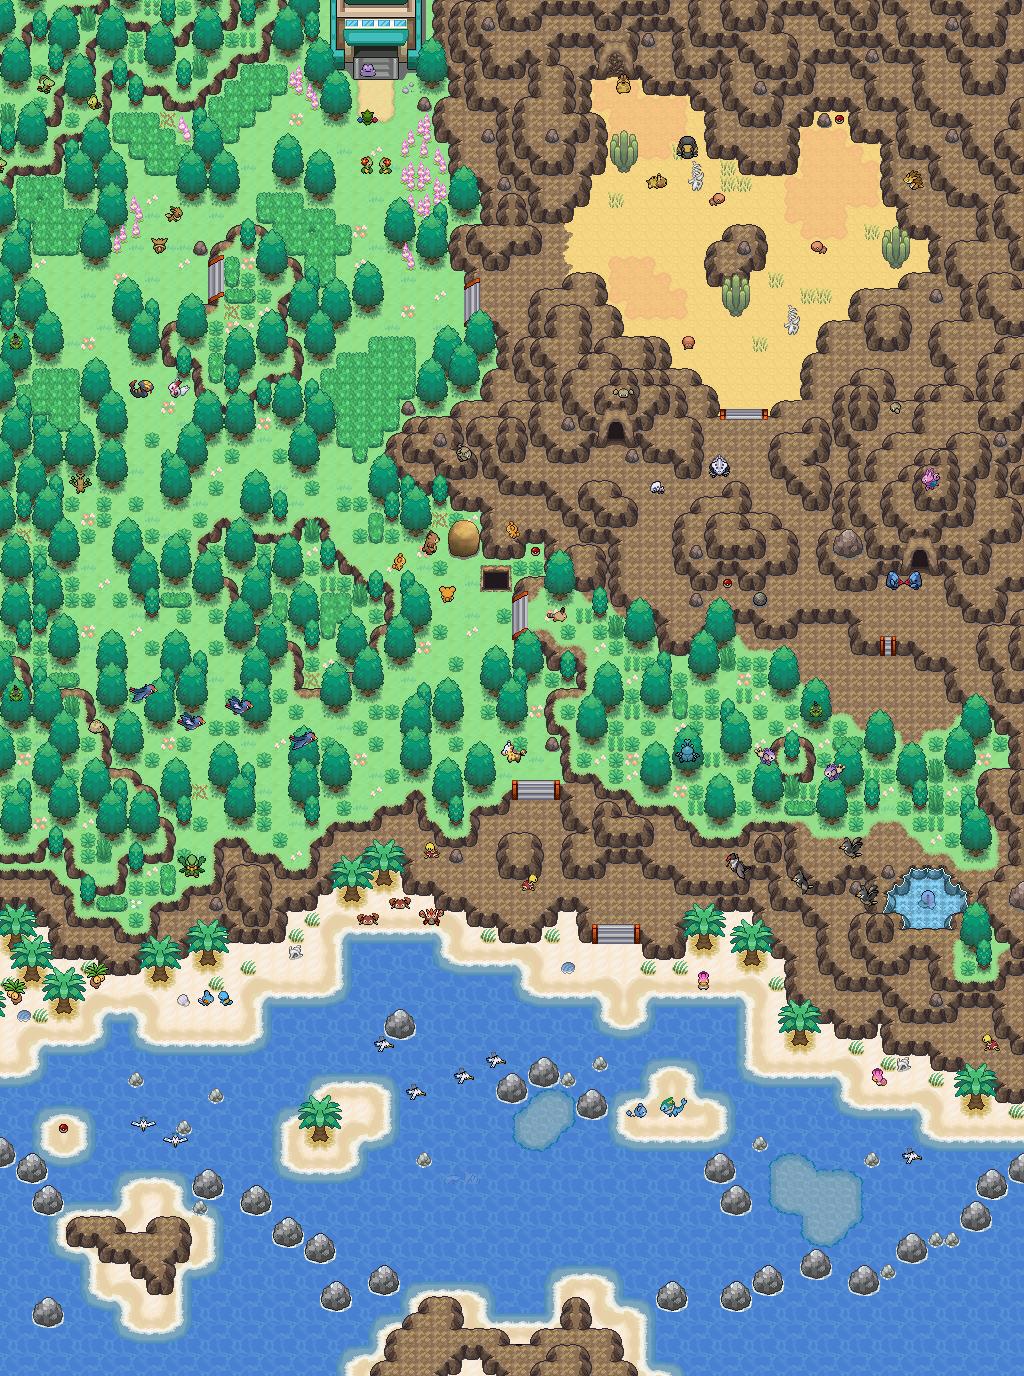 Pokémon-Map: Safarizone